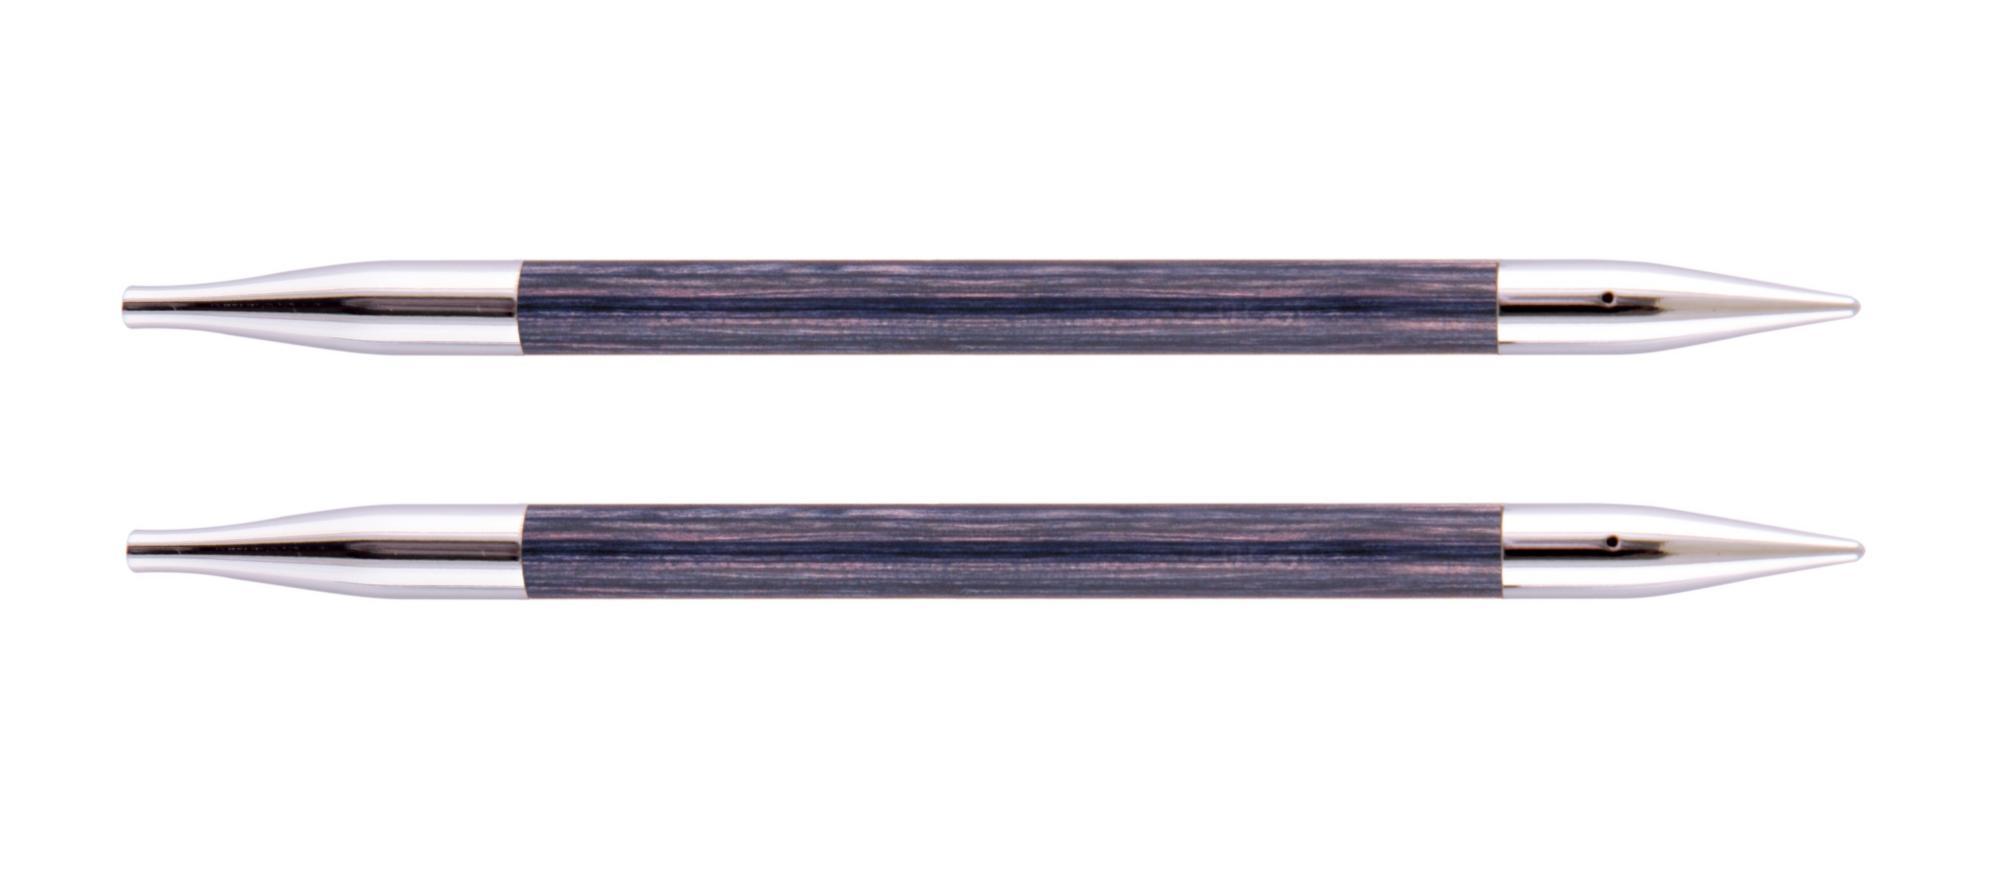 Спицы съемные Royale KnitPro, 29260, 6.50 мм